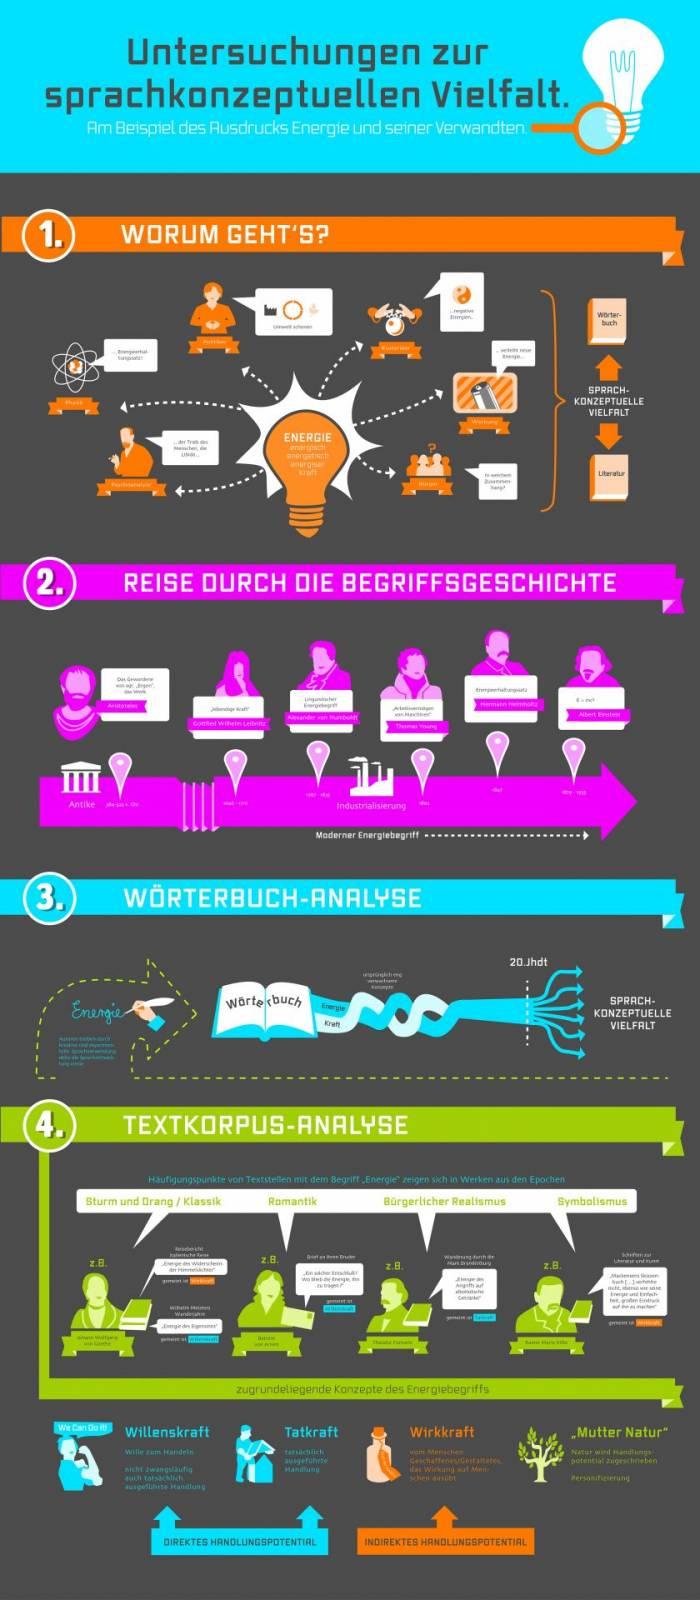 Infografik Adobe Unicum Illustration